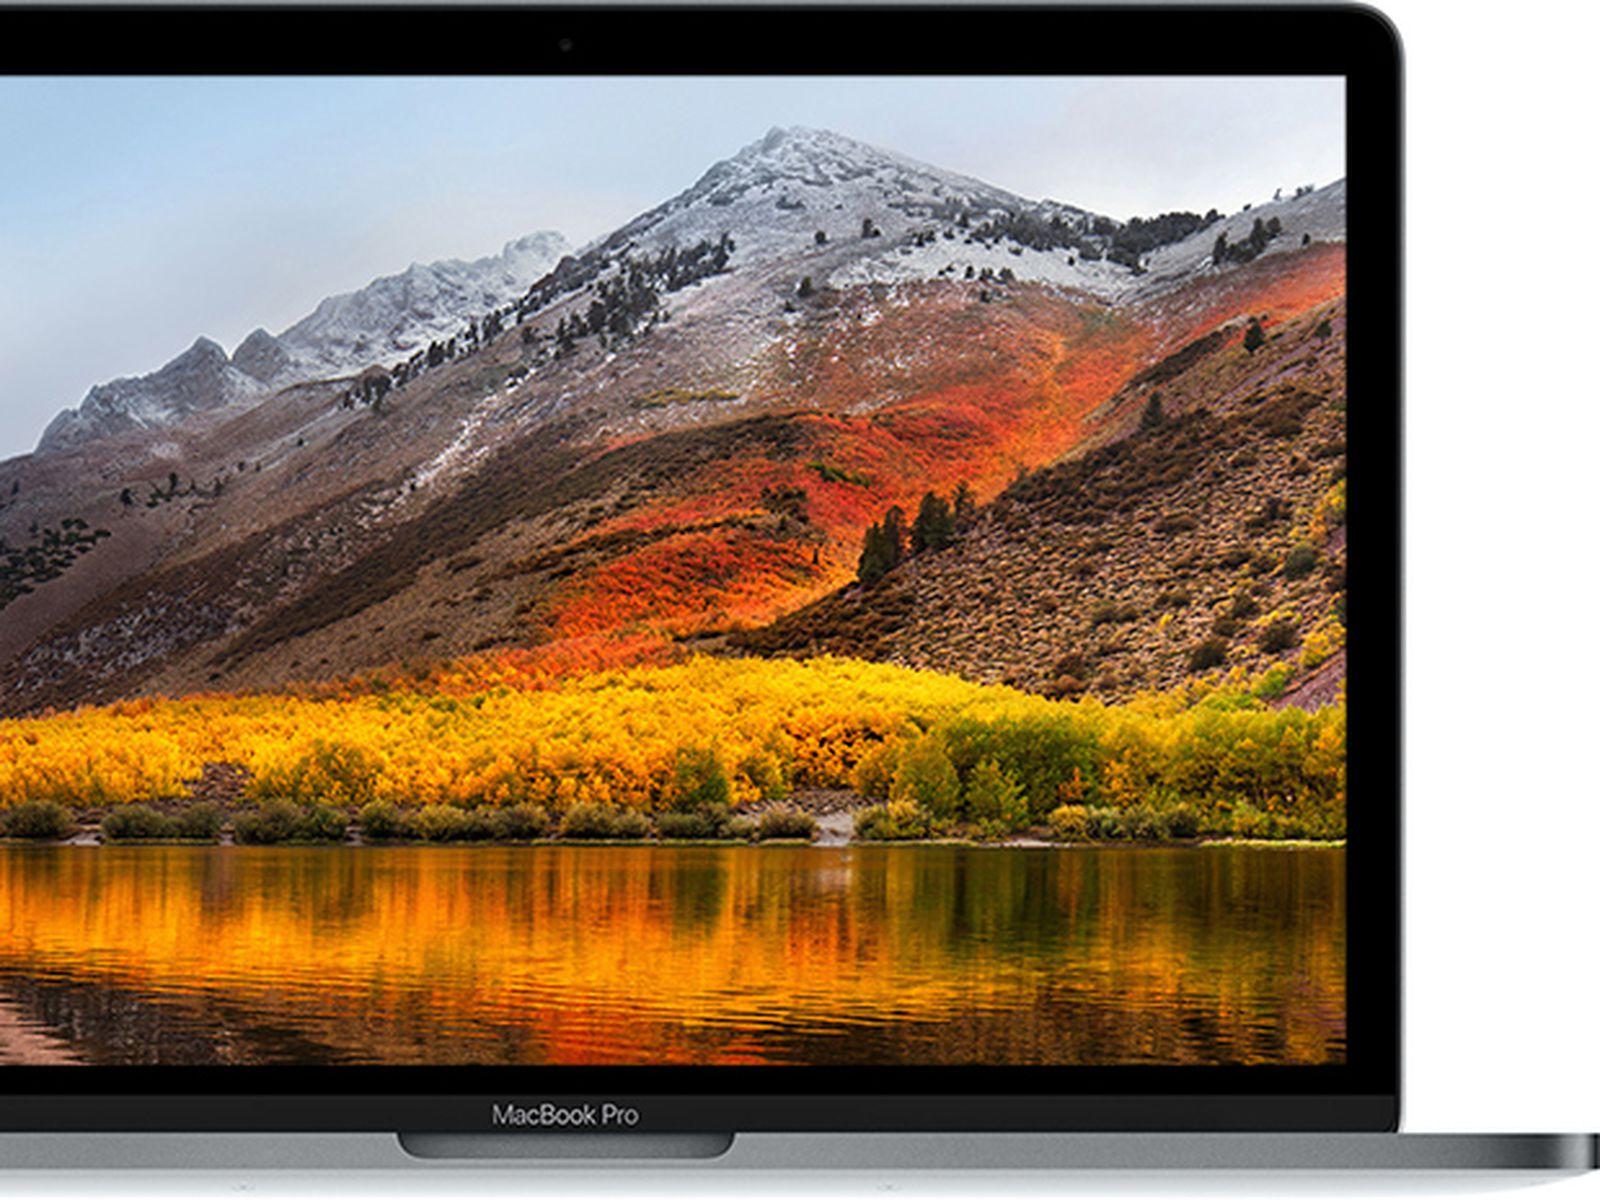 Update to mac high sierra